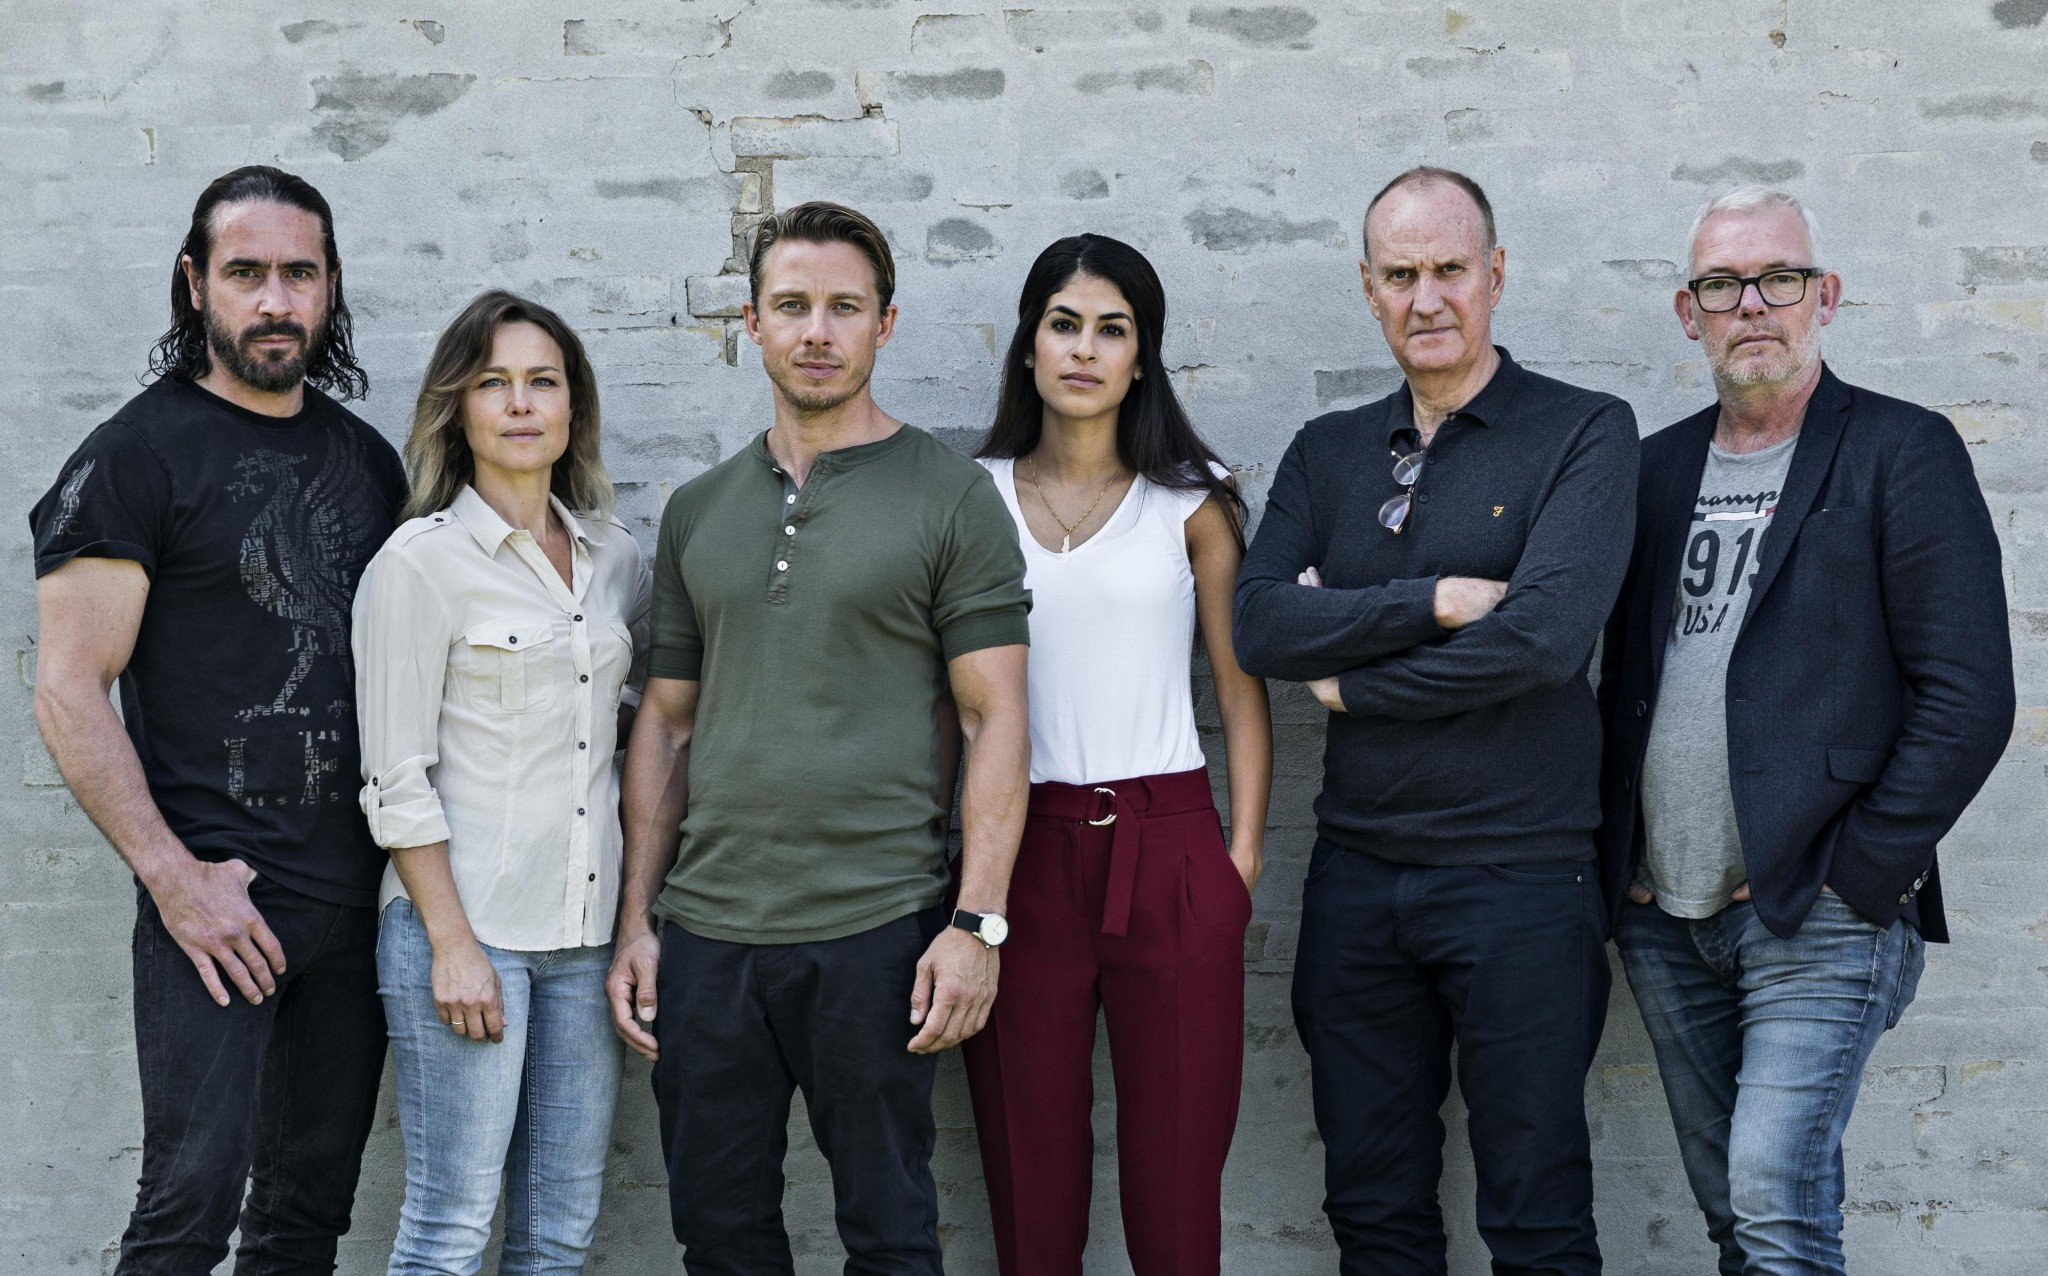 Gidseltagningen 2 skuespillere Kanal 5